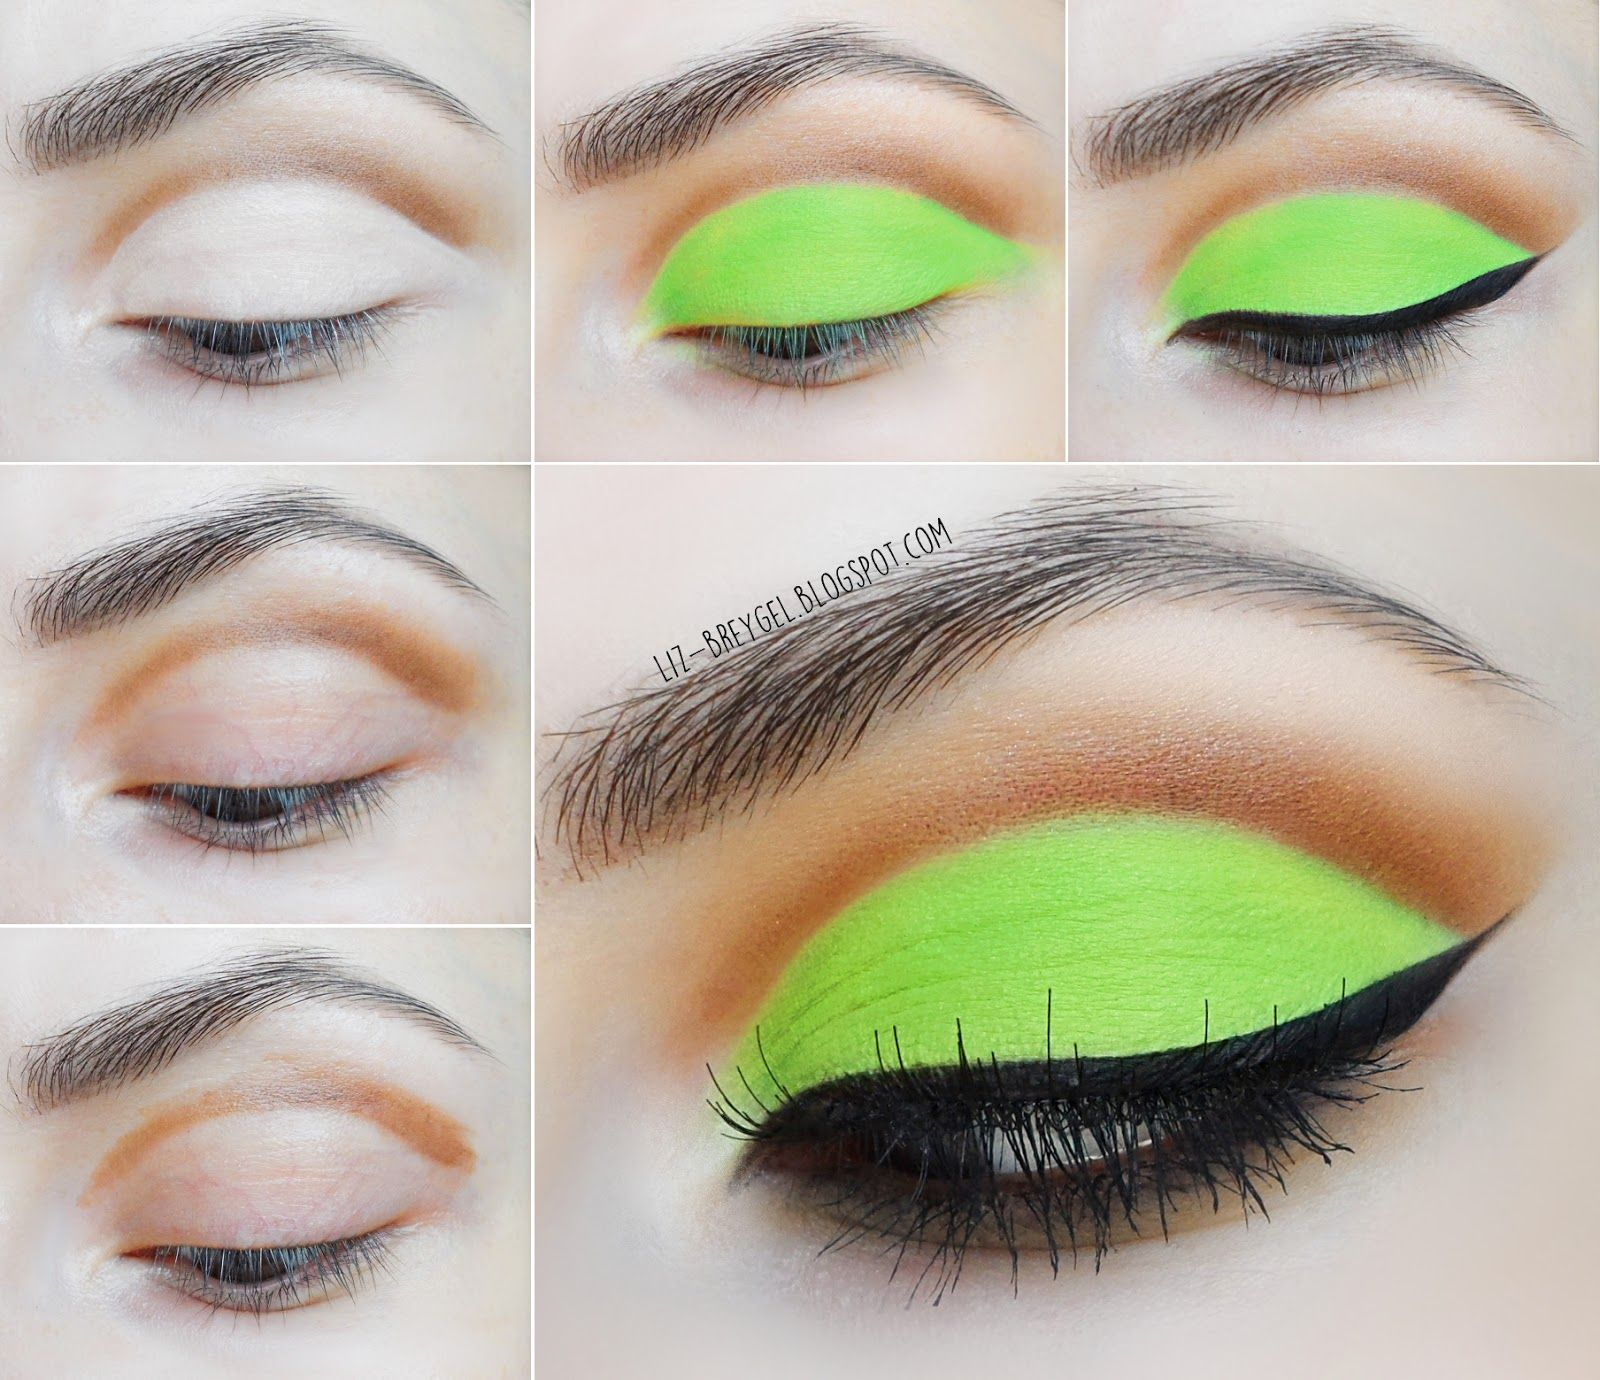 Liz breygel blogger makeup bright matte green step by step bright acid neon green eye makeup step by step tutorial summer zombie monster high makeup baditri Images